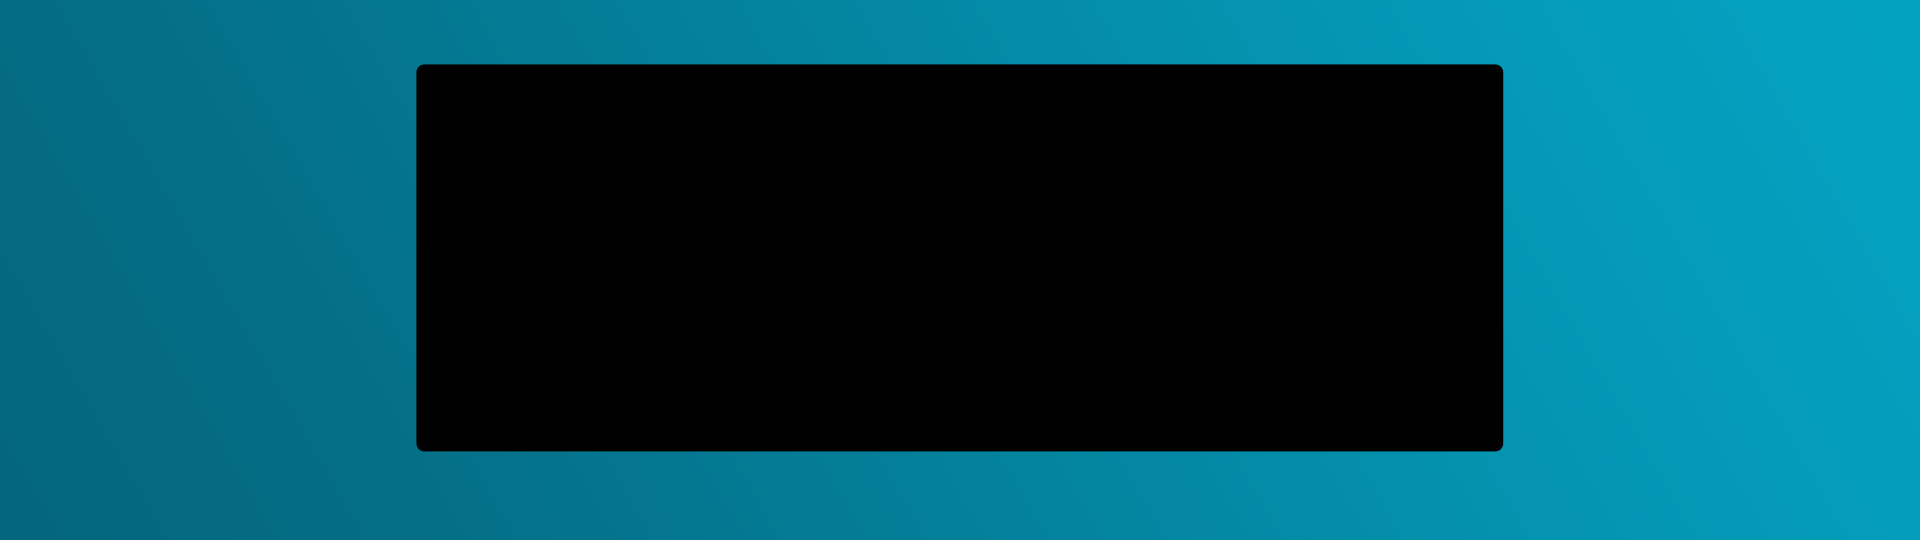 CATEGORY-TEL-GENERICTELEFON-20-02